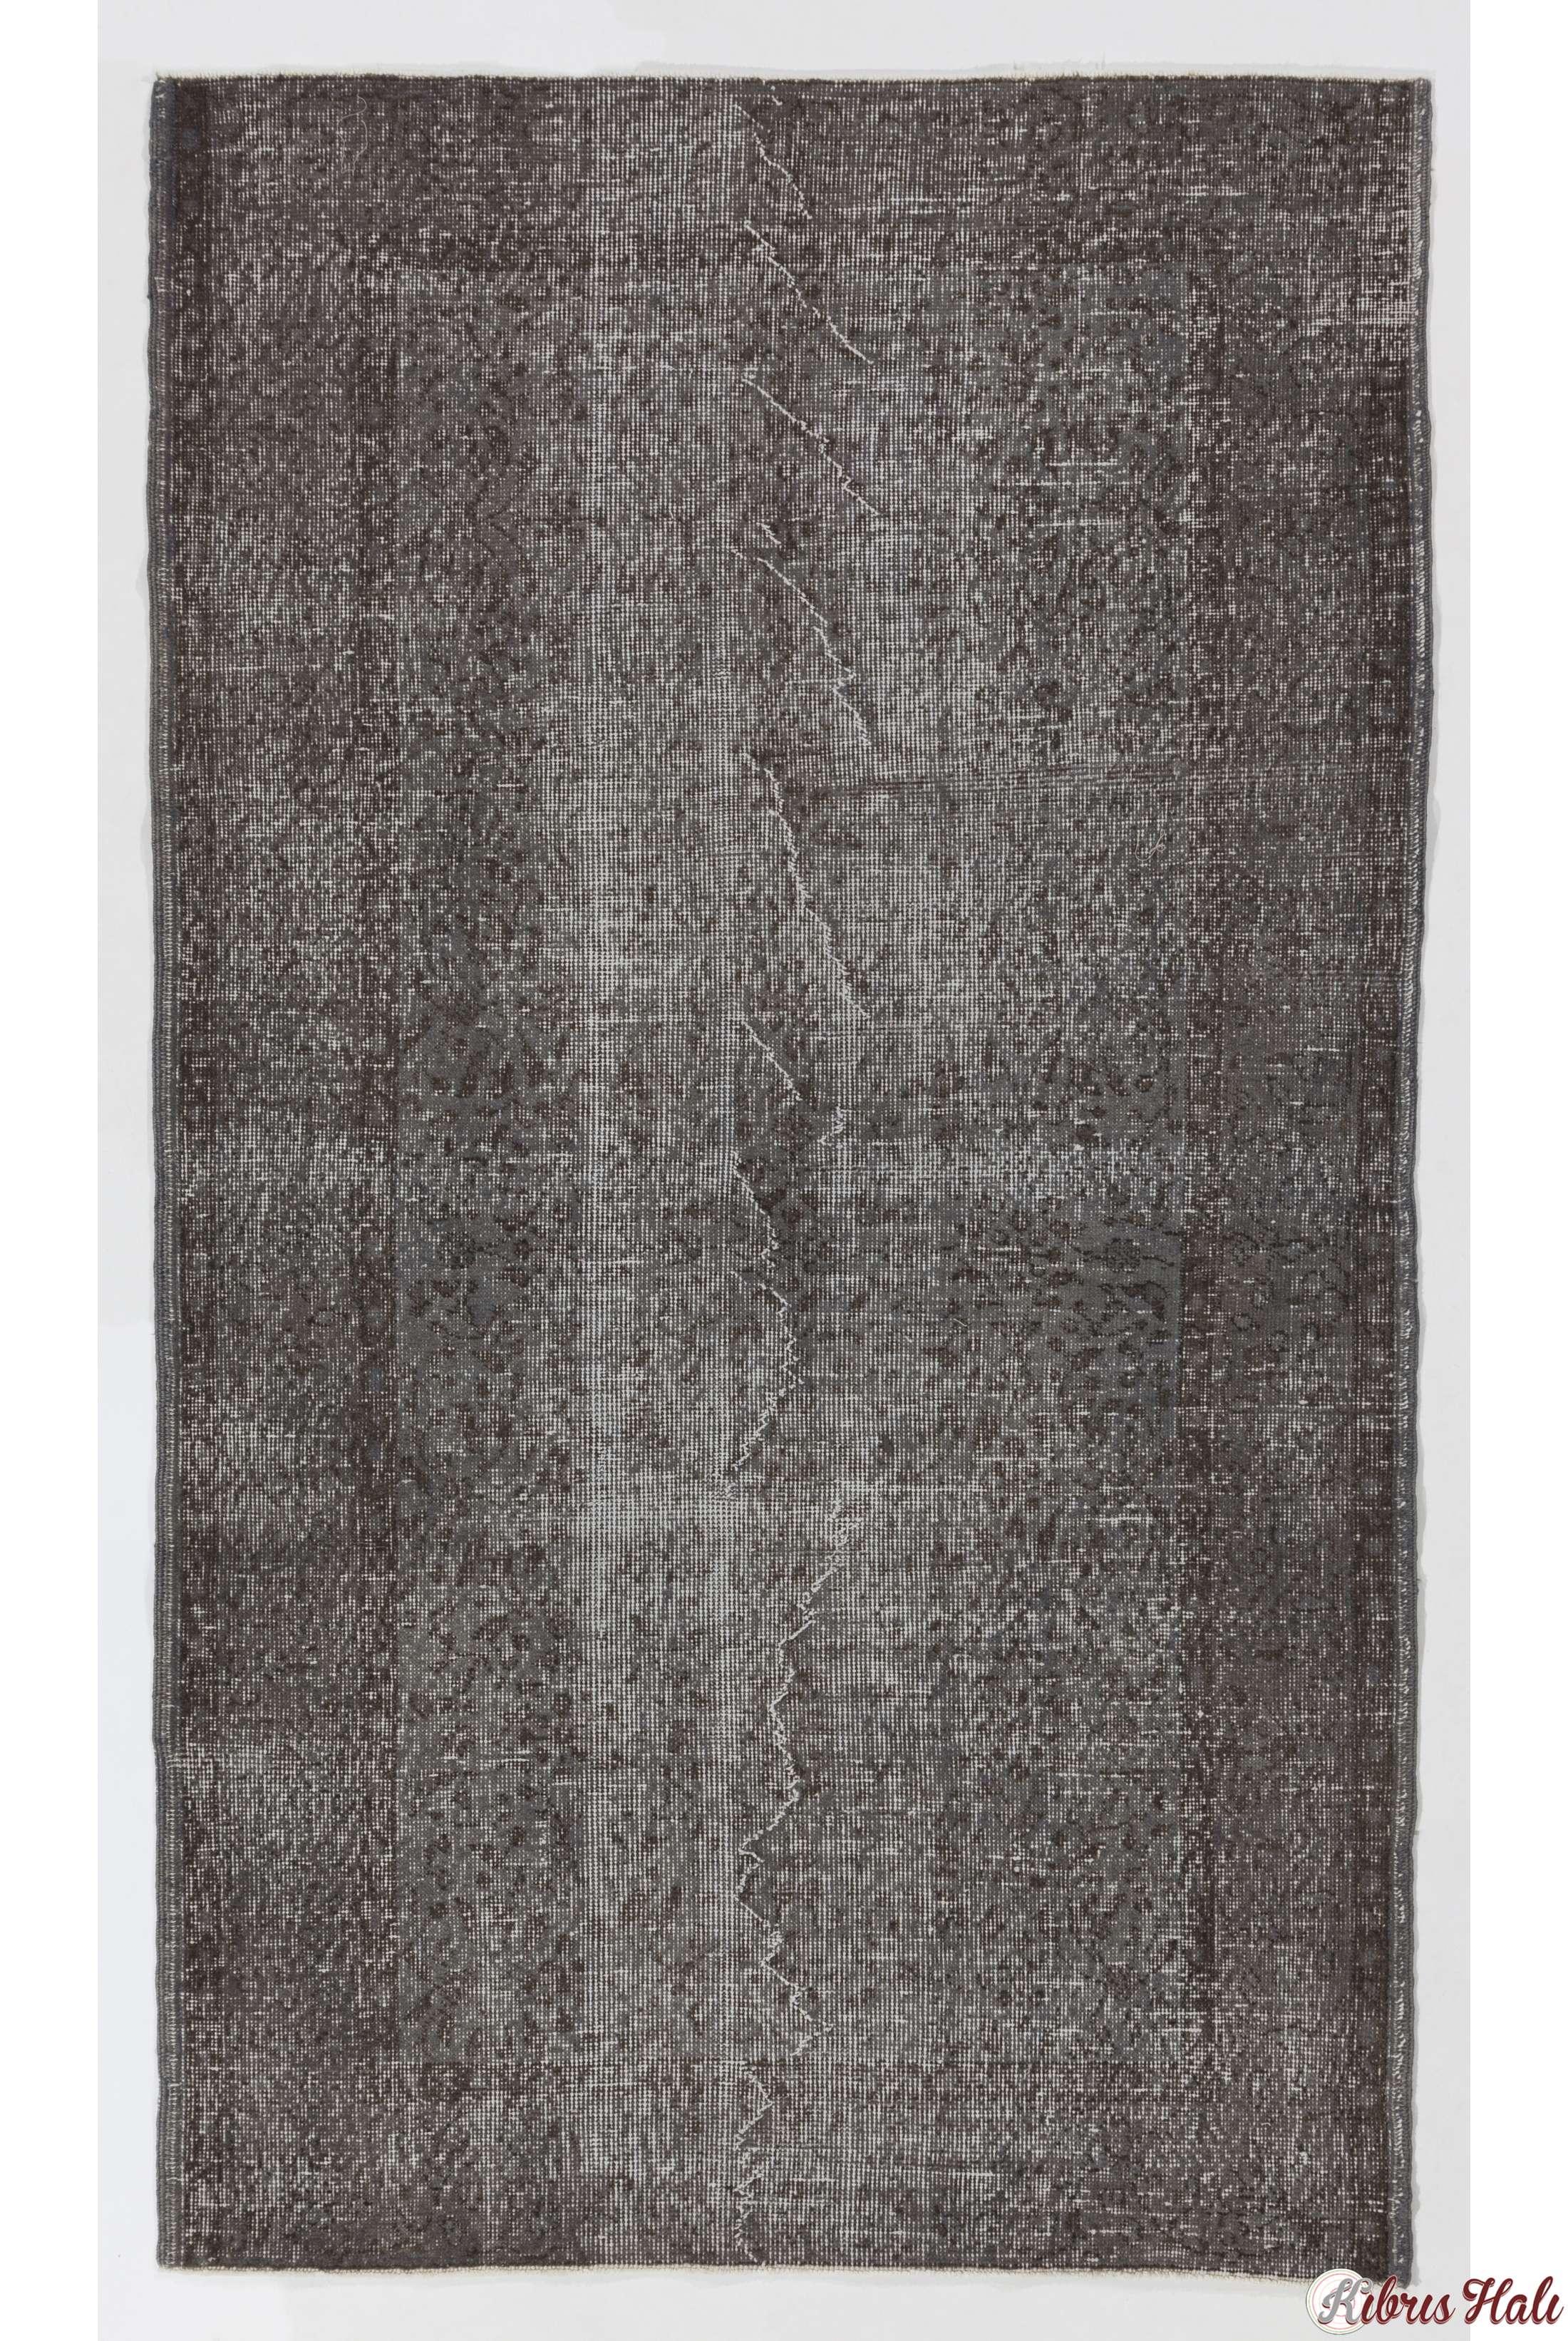 115 x 200 cm gri eskitilmi overdyed eldokumas t rk hal s. Black Bedroom Furniture Sets. Home Design Ideas